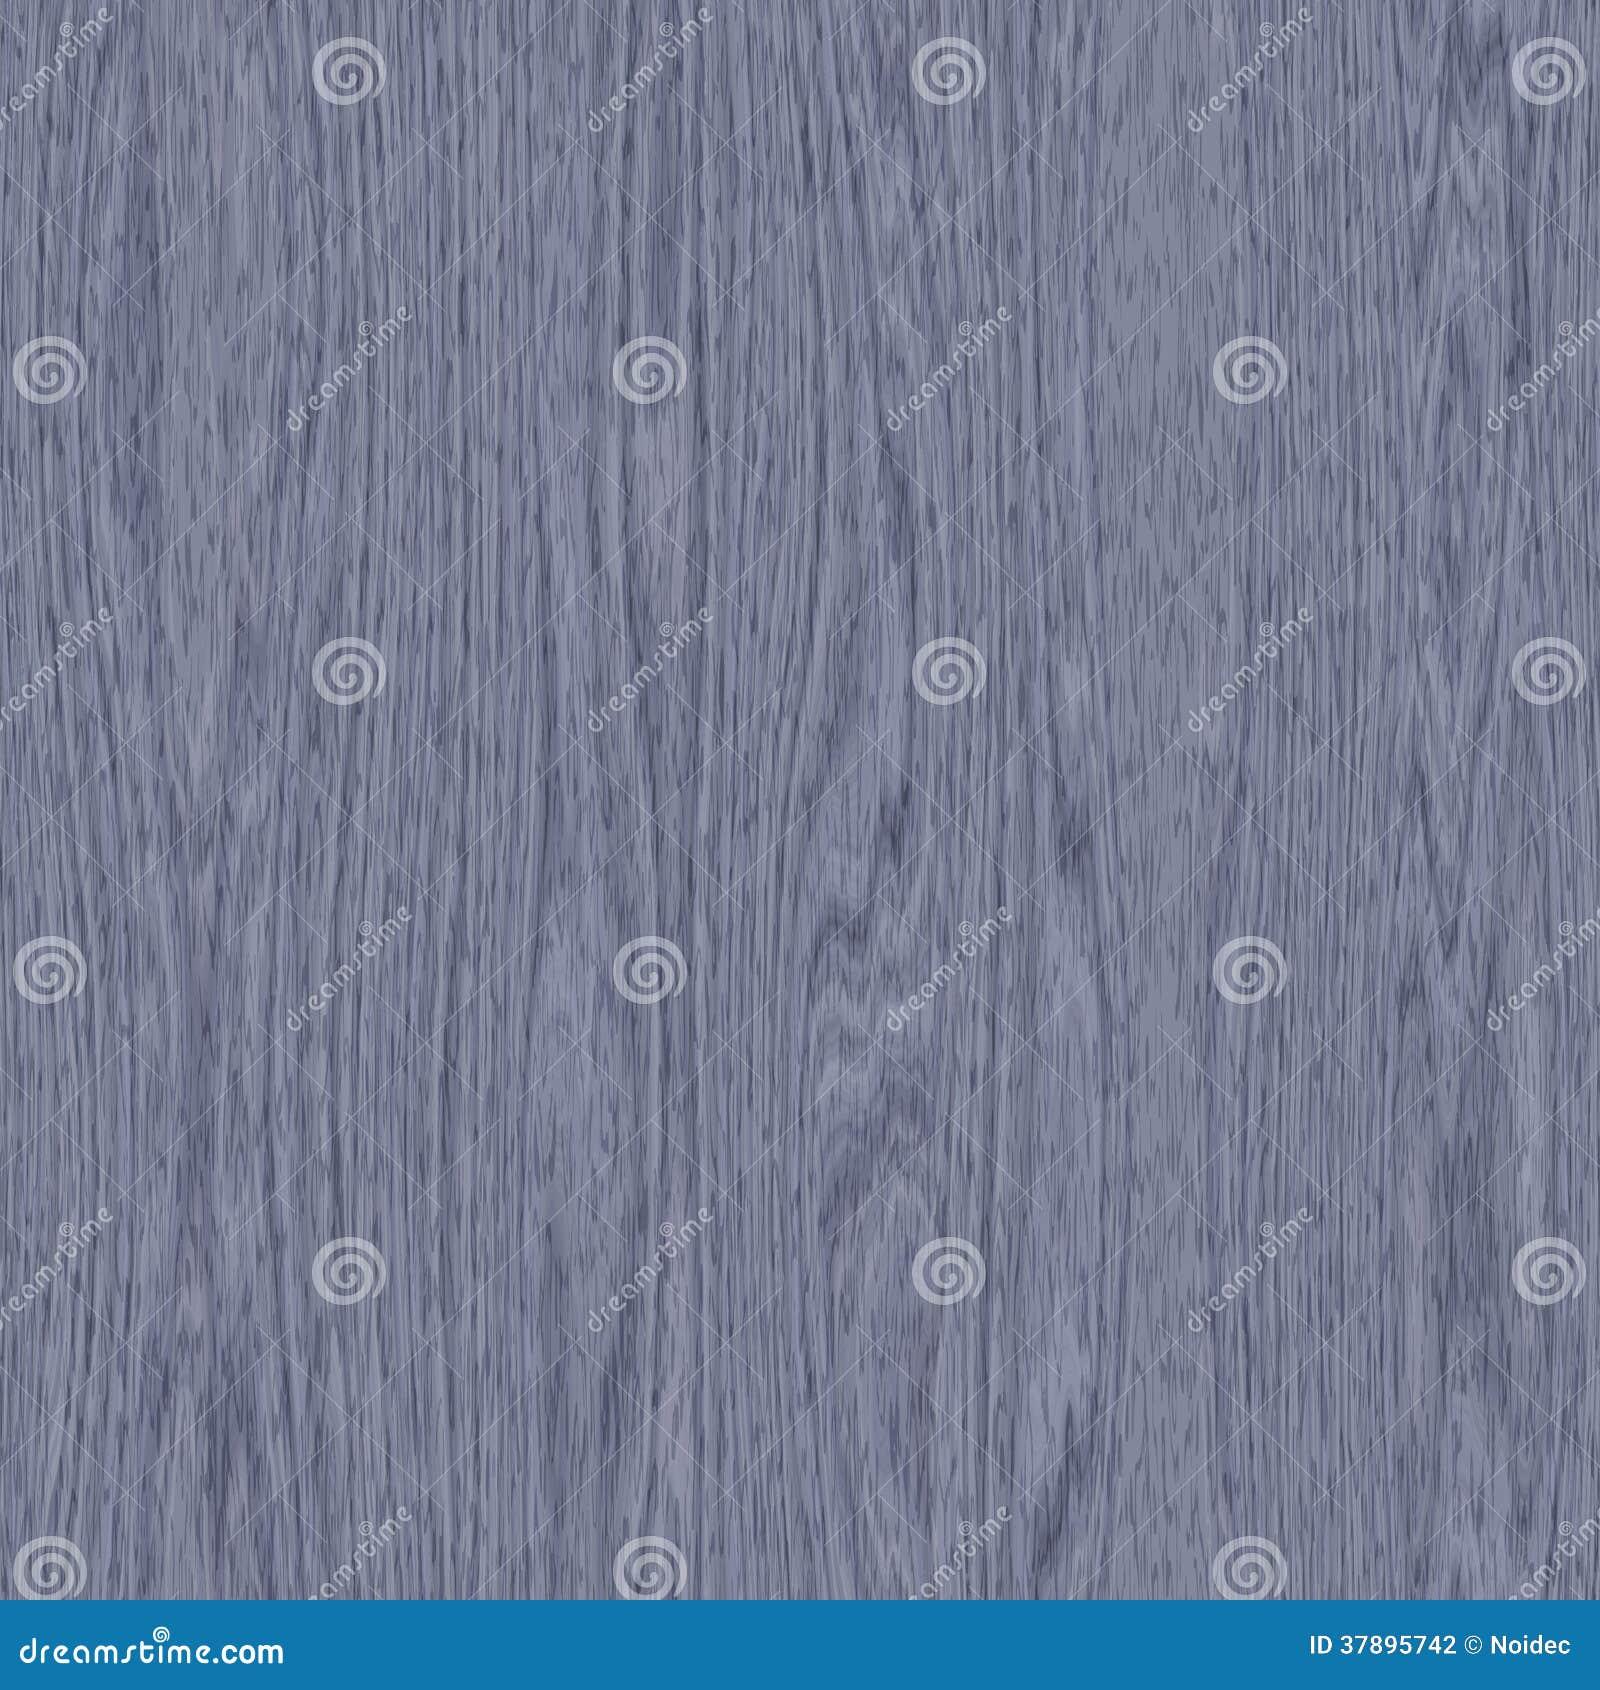 Fondo inconsútil de madera de la textura.